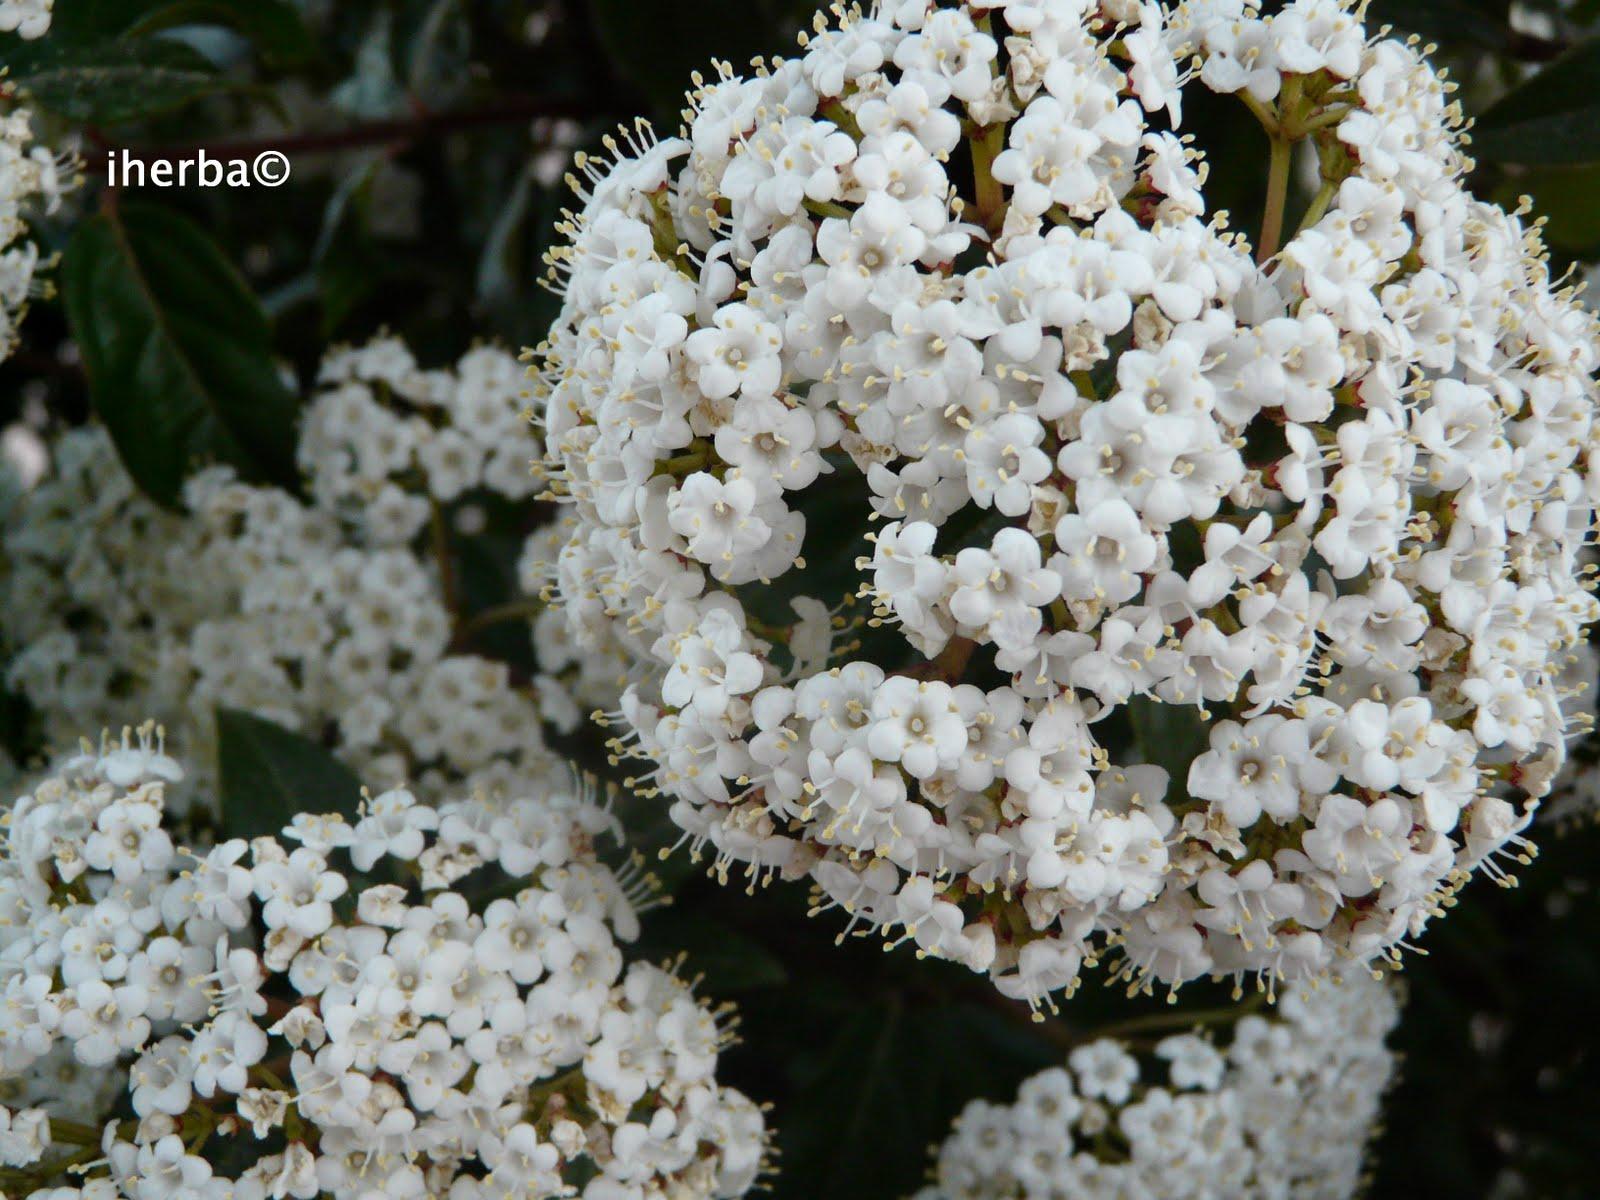 Arbusto de hoja perenne calistemond la salvia es un for Arbustos de hoja perenne resistentes al frio